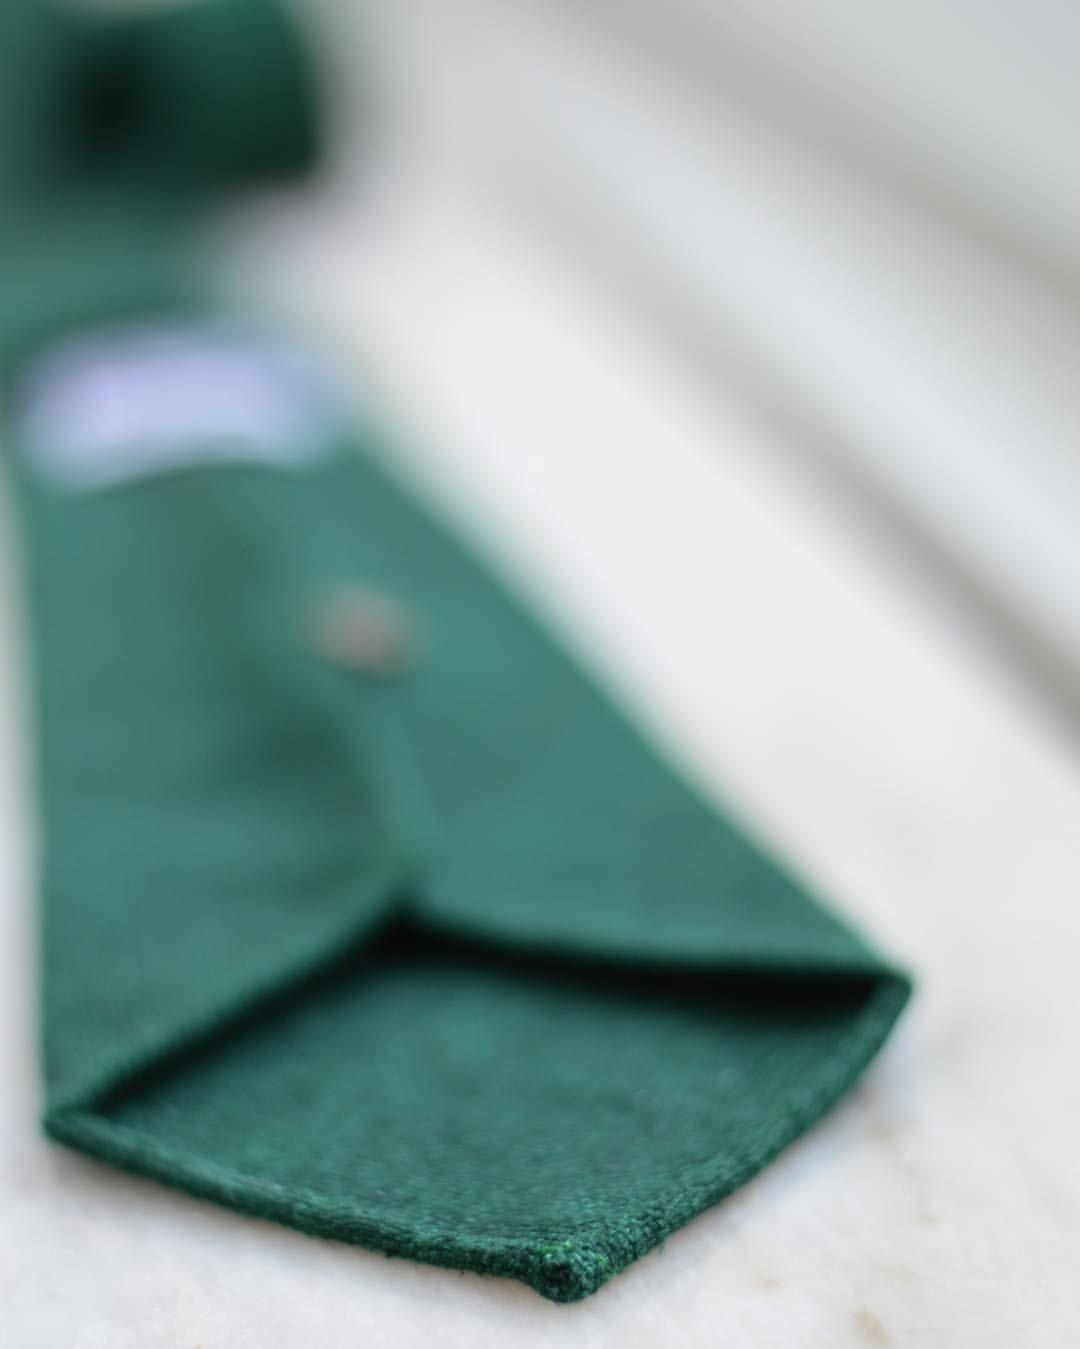 Grovsnus - toquote:   Custom made tie from @fserraiocco in a...